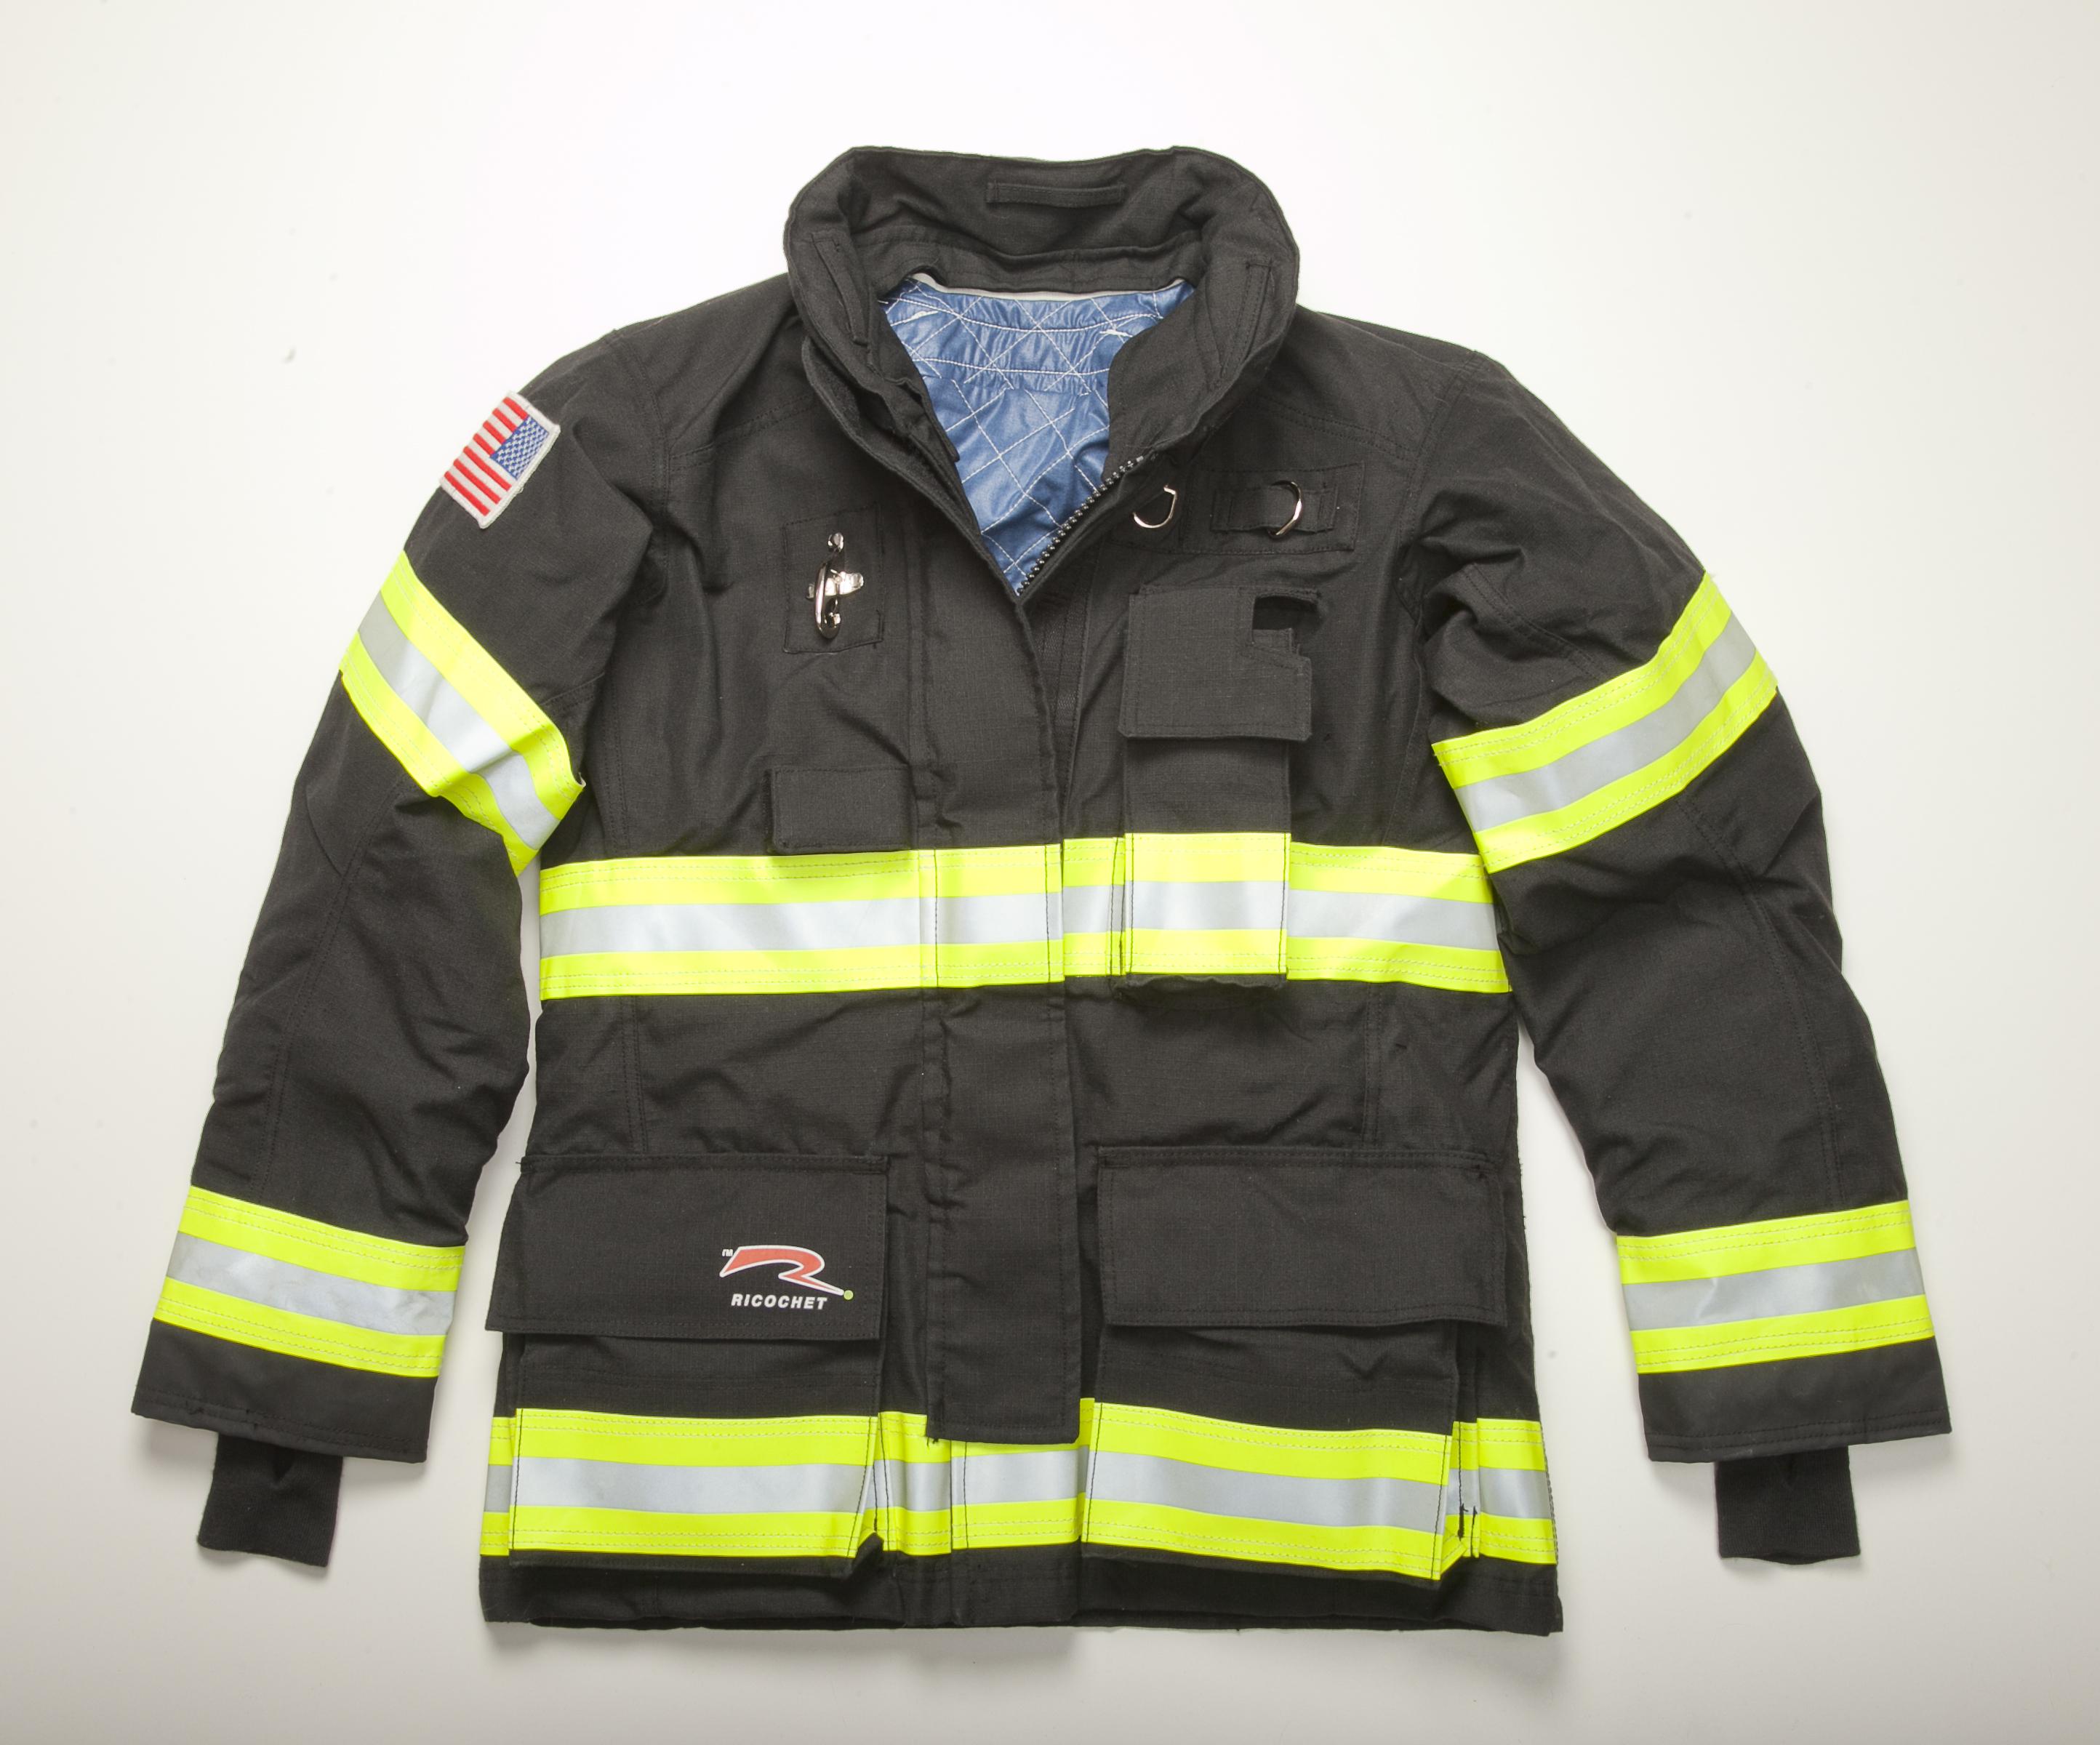 Ricochet M2 Jacket Firefighter Turnout Gear